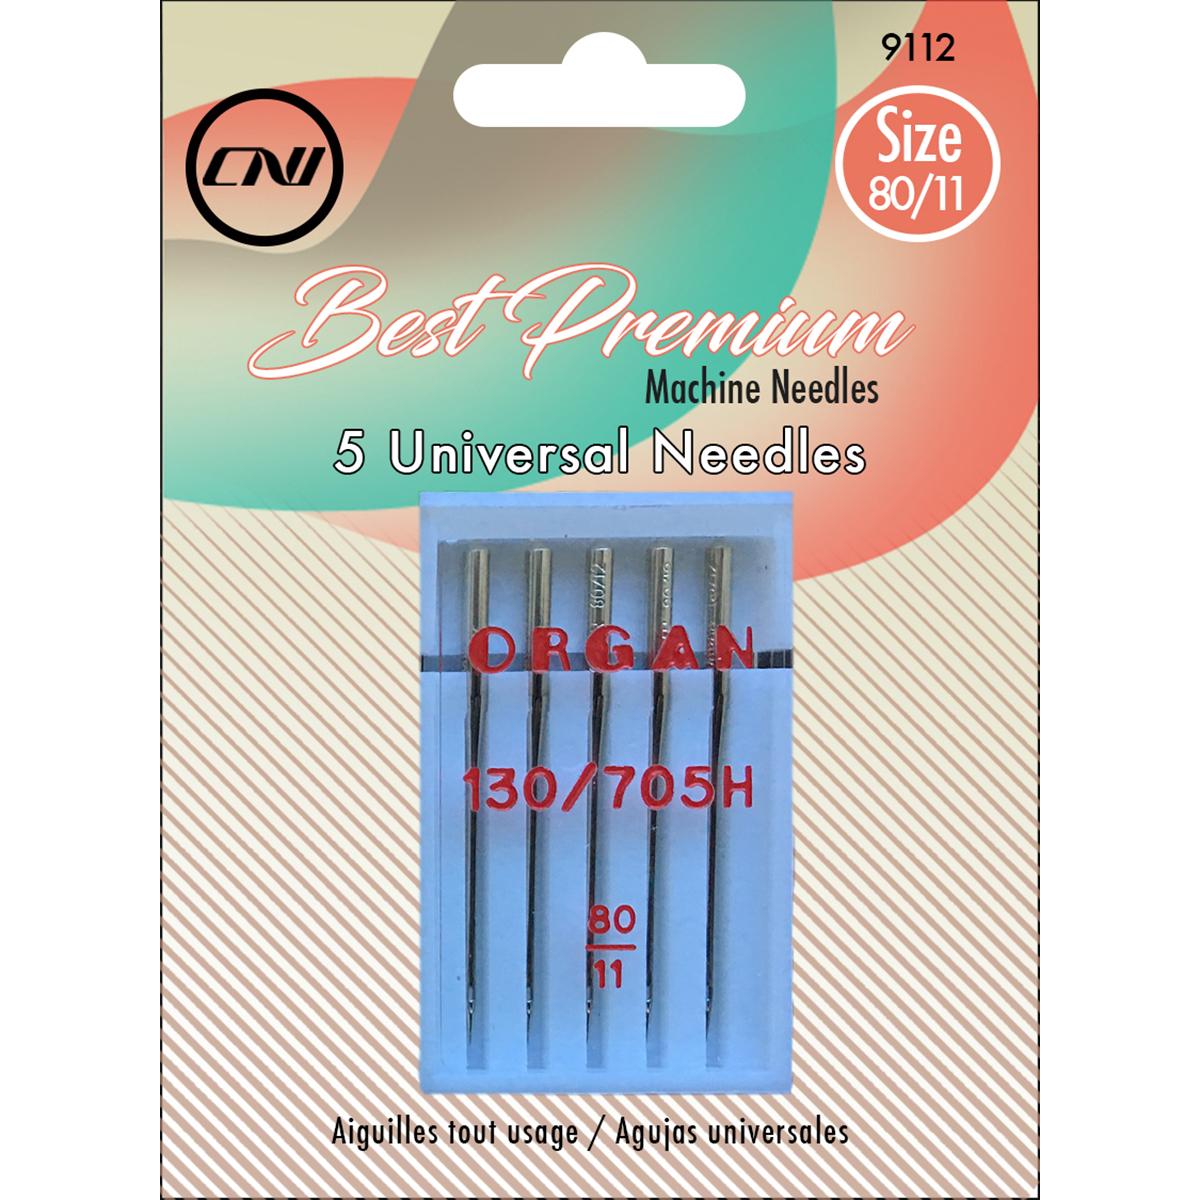 Size 80/11 - Universal Sewing Machine Needles 5/Pkg